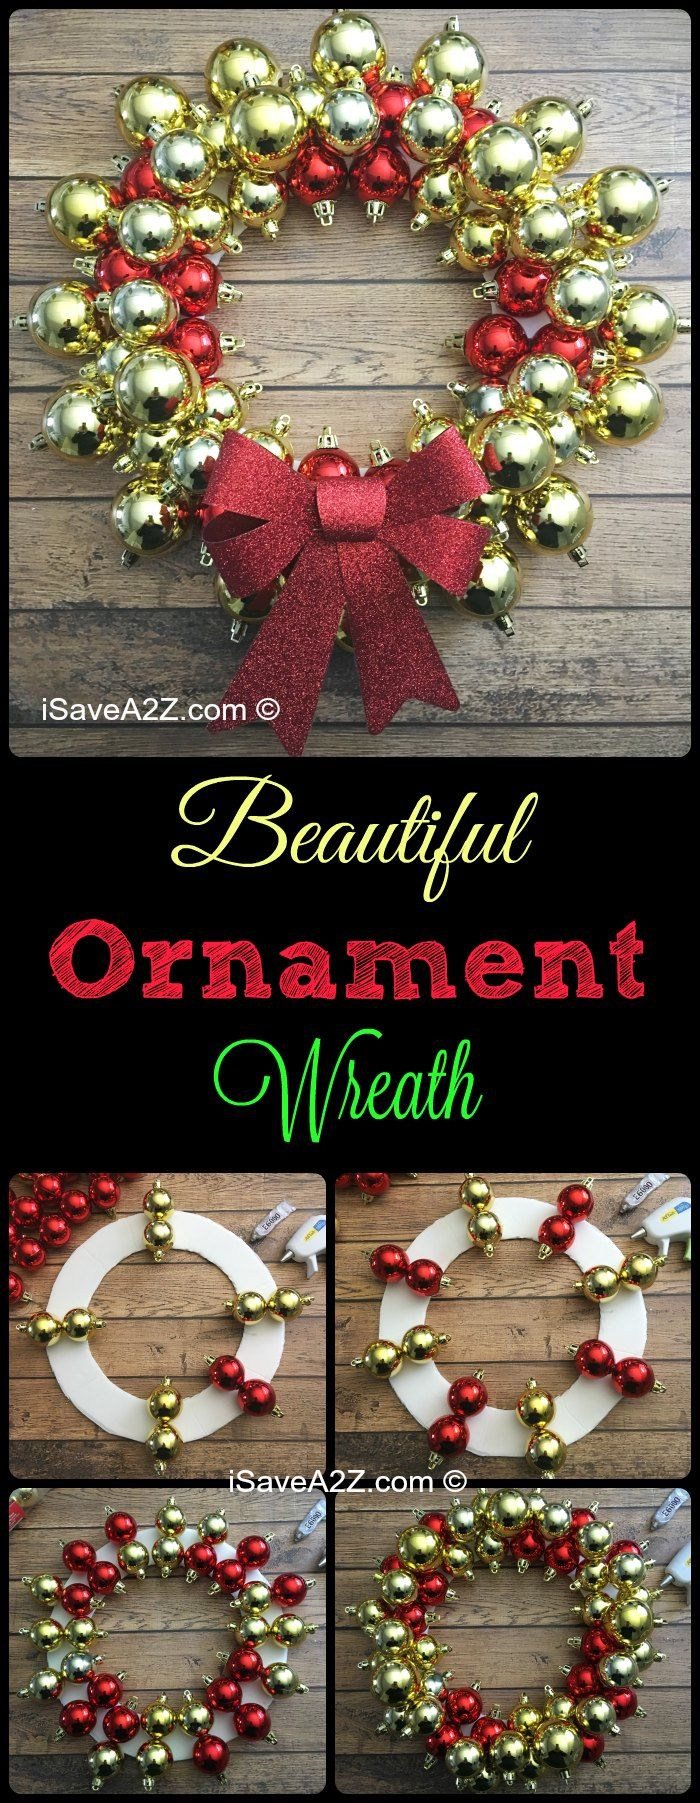 How to Make an Ornament Wreath | Christmas wreaths ...